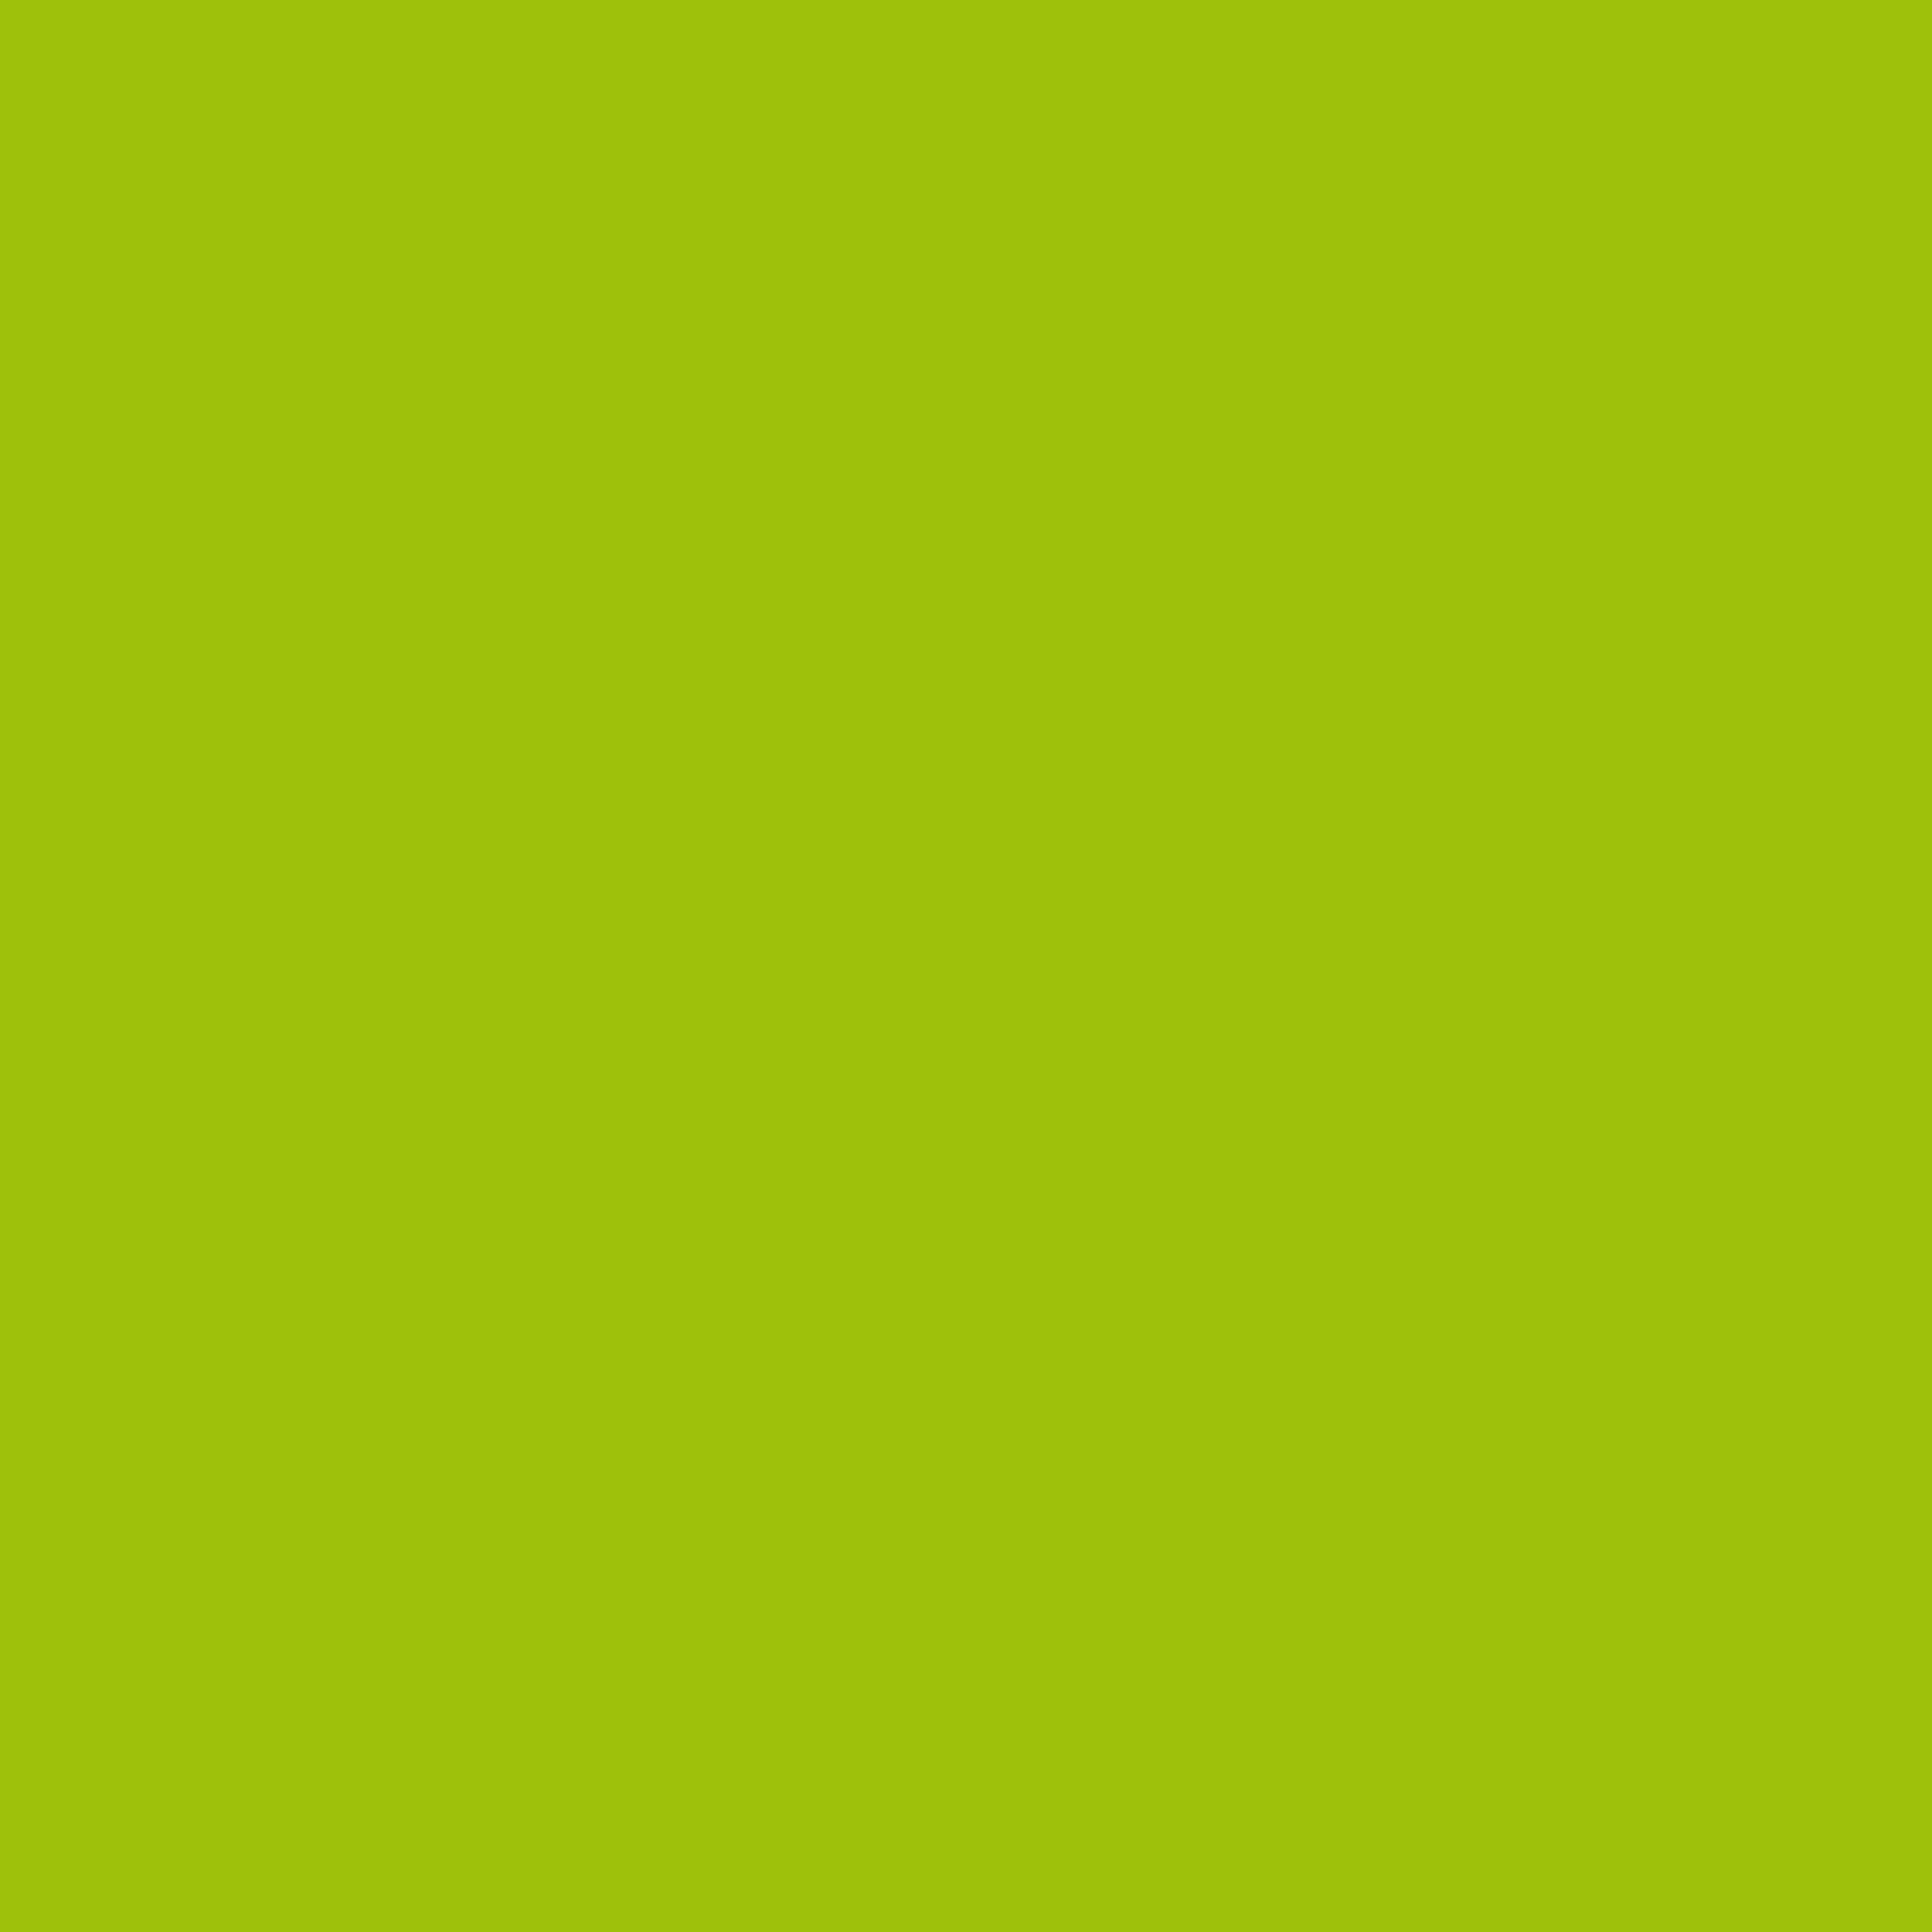 2732x2732 Limerick Solid Color Background